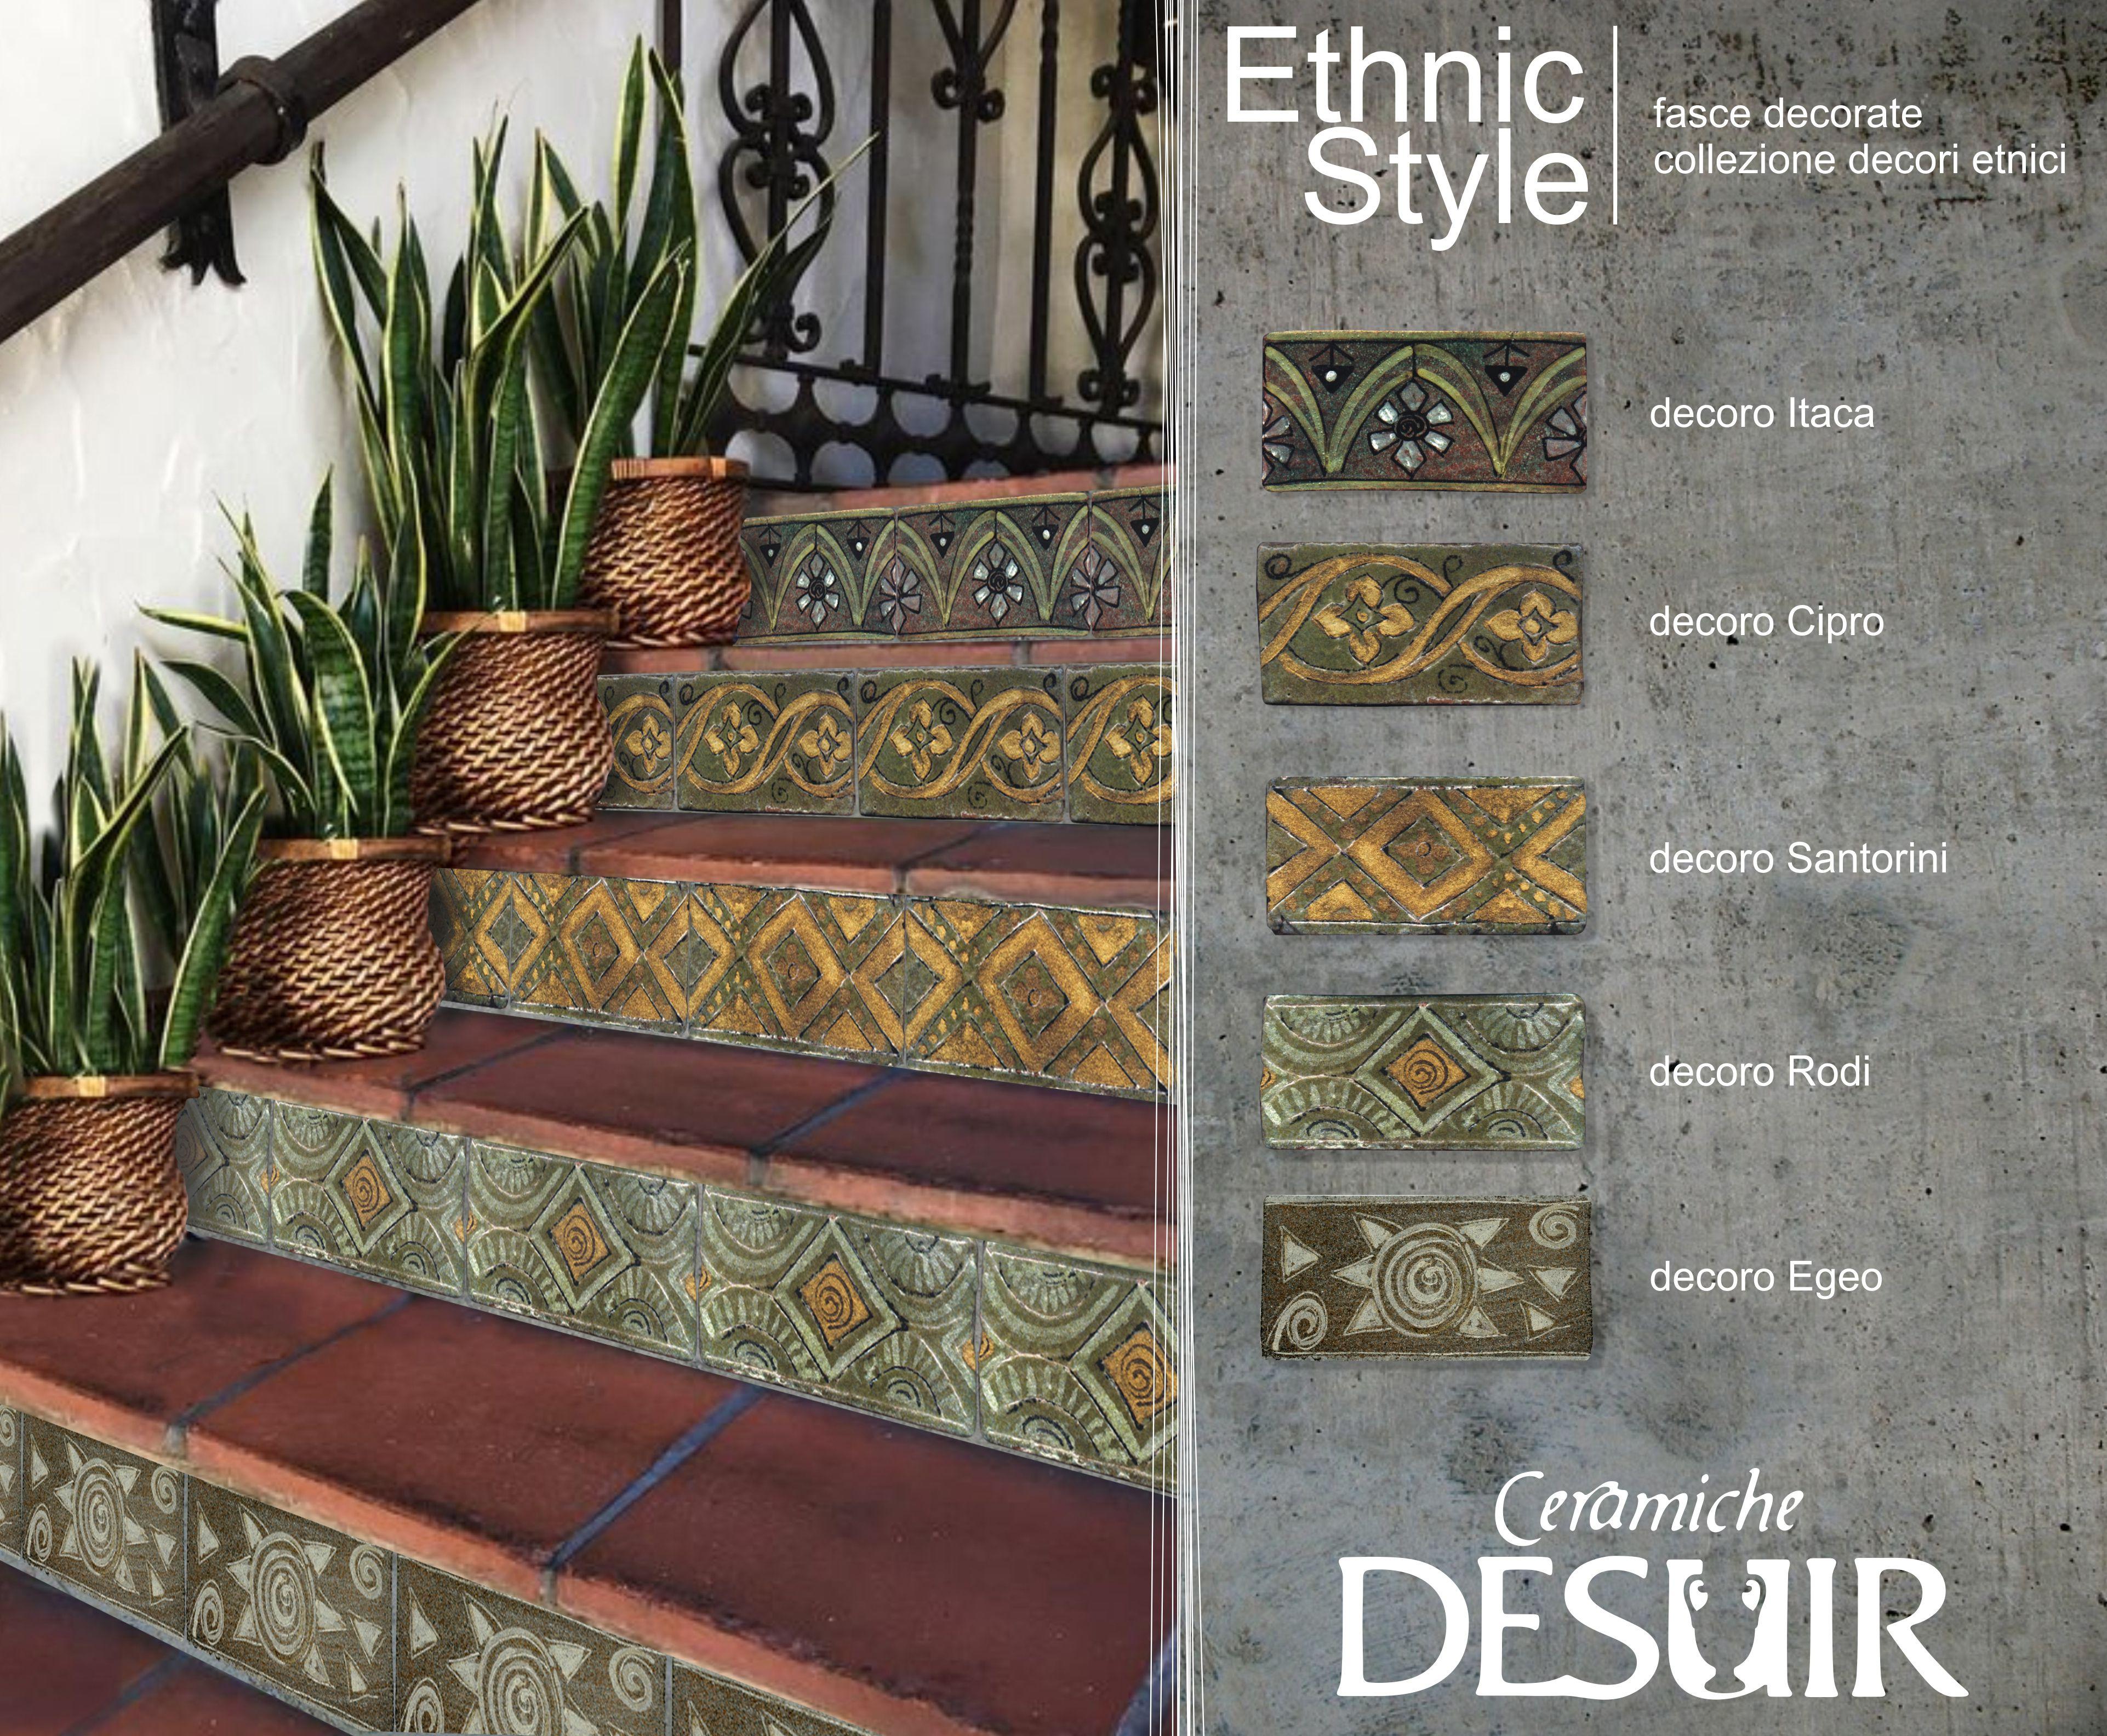 Piastrelle stileetnico ethnic ethnicstyle tile tiles band